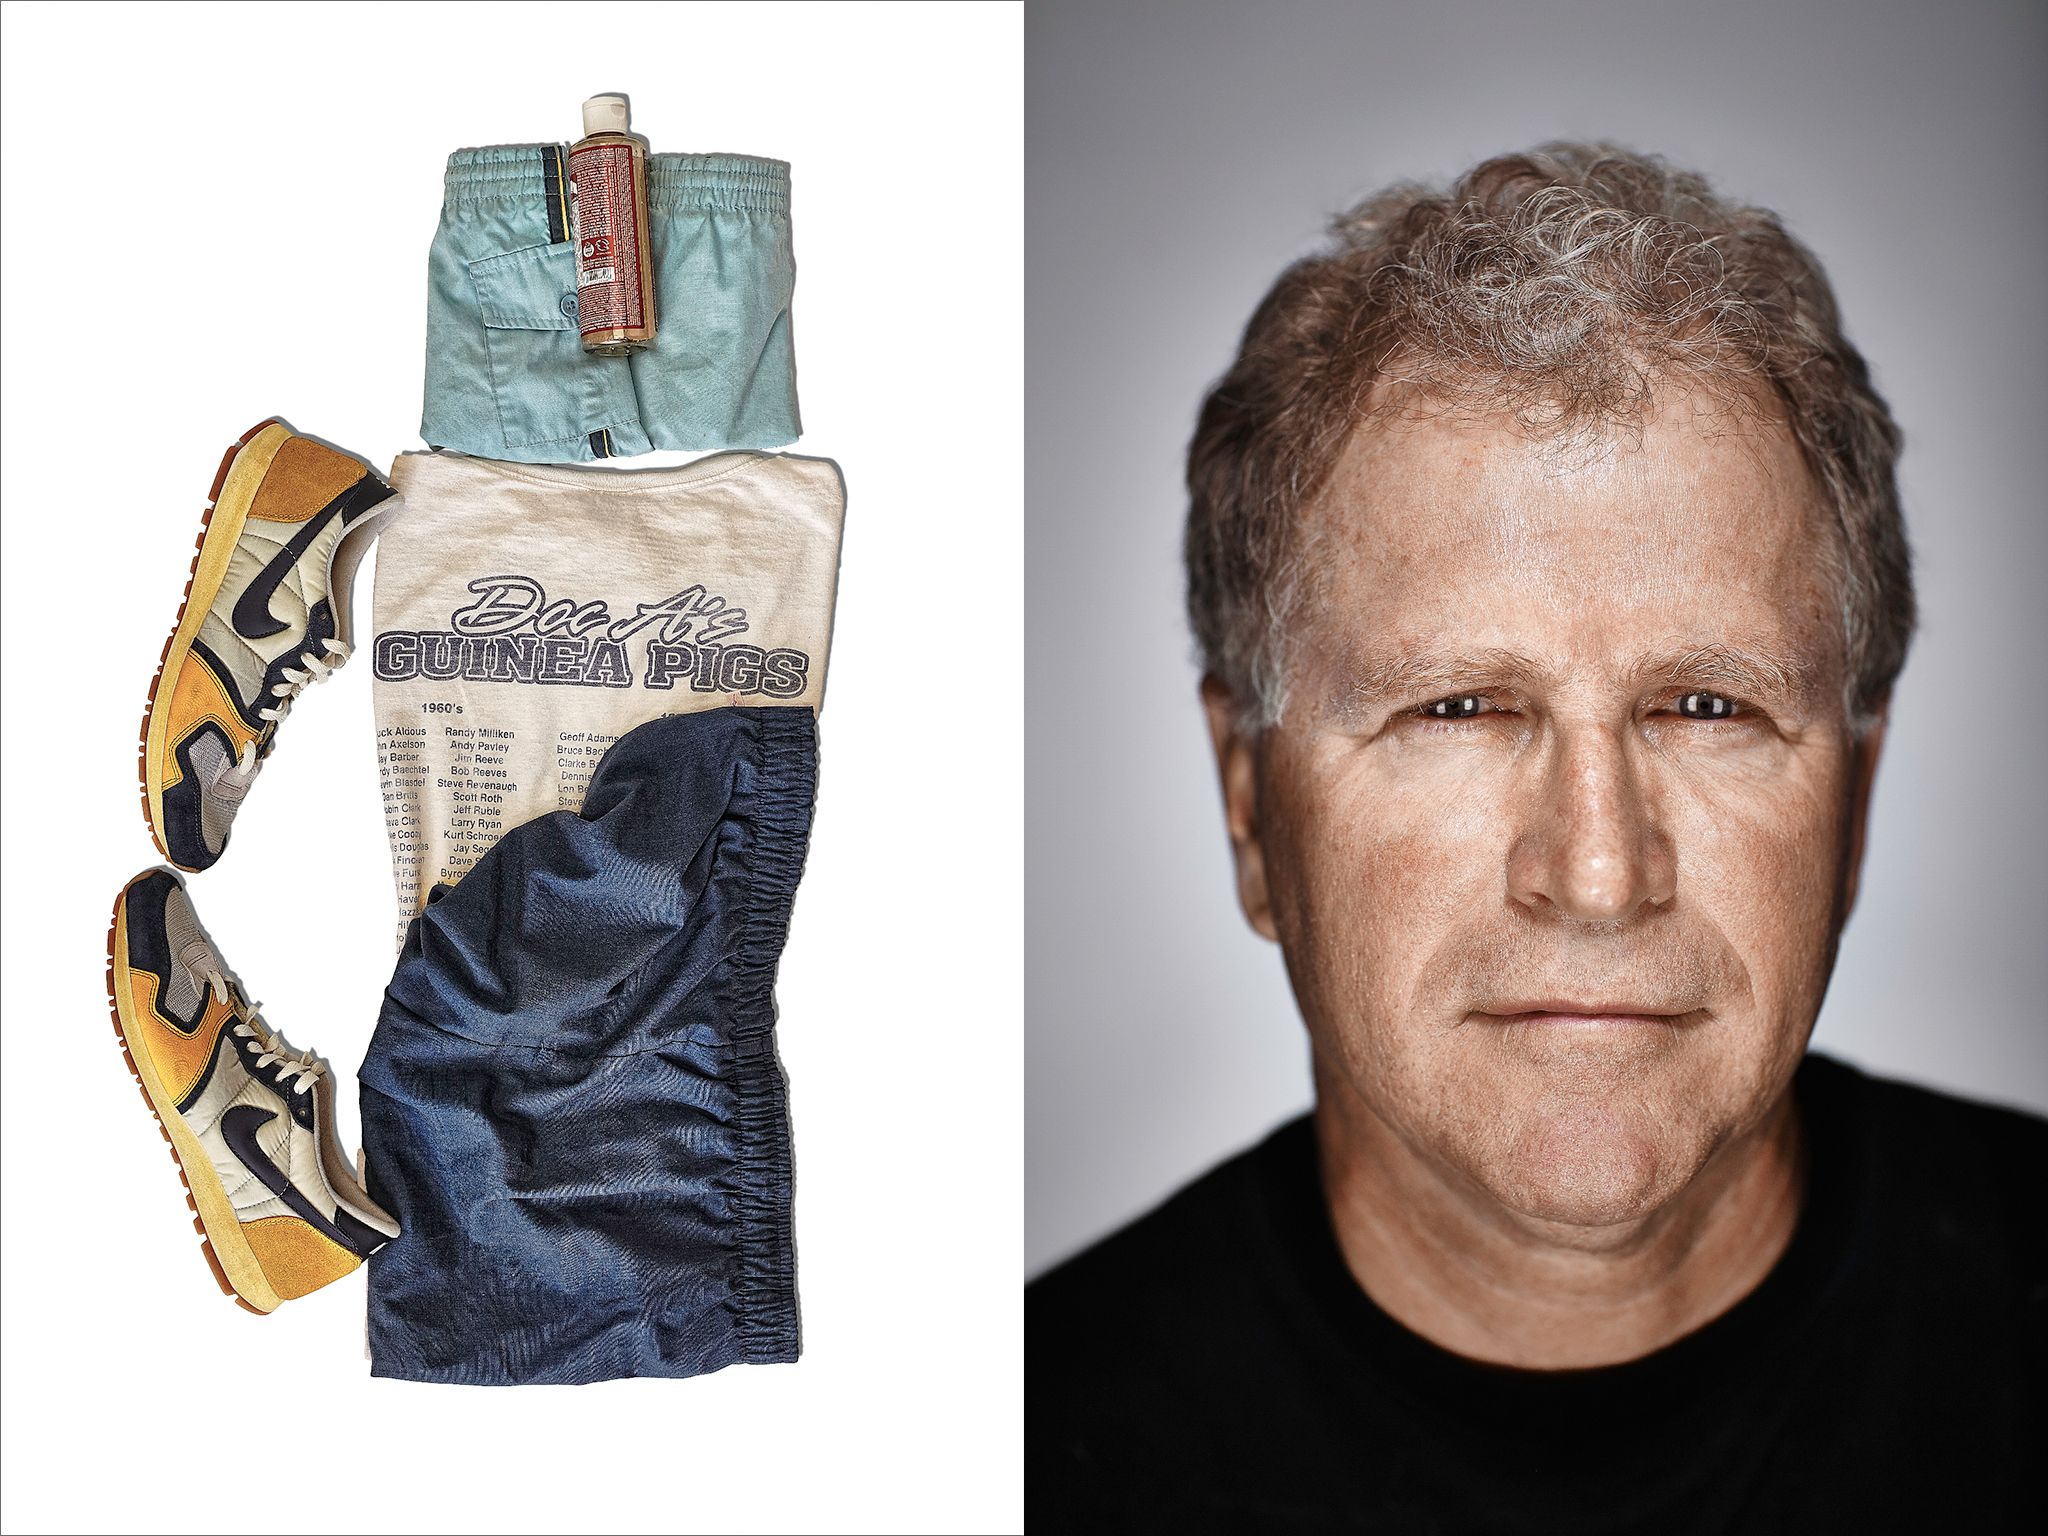 Doug Peck - The Original Ultramarathoner | Vance Jacobs Photographer